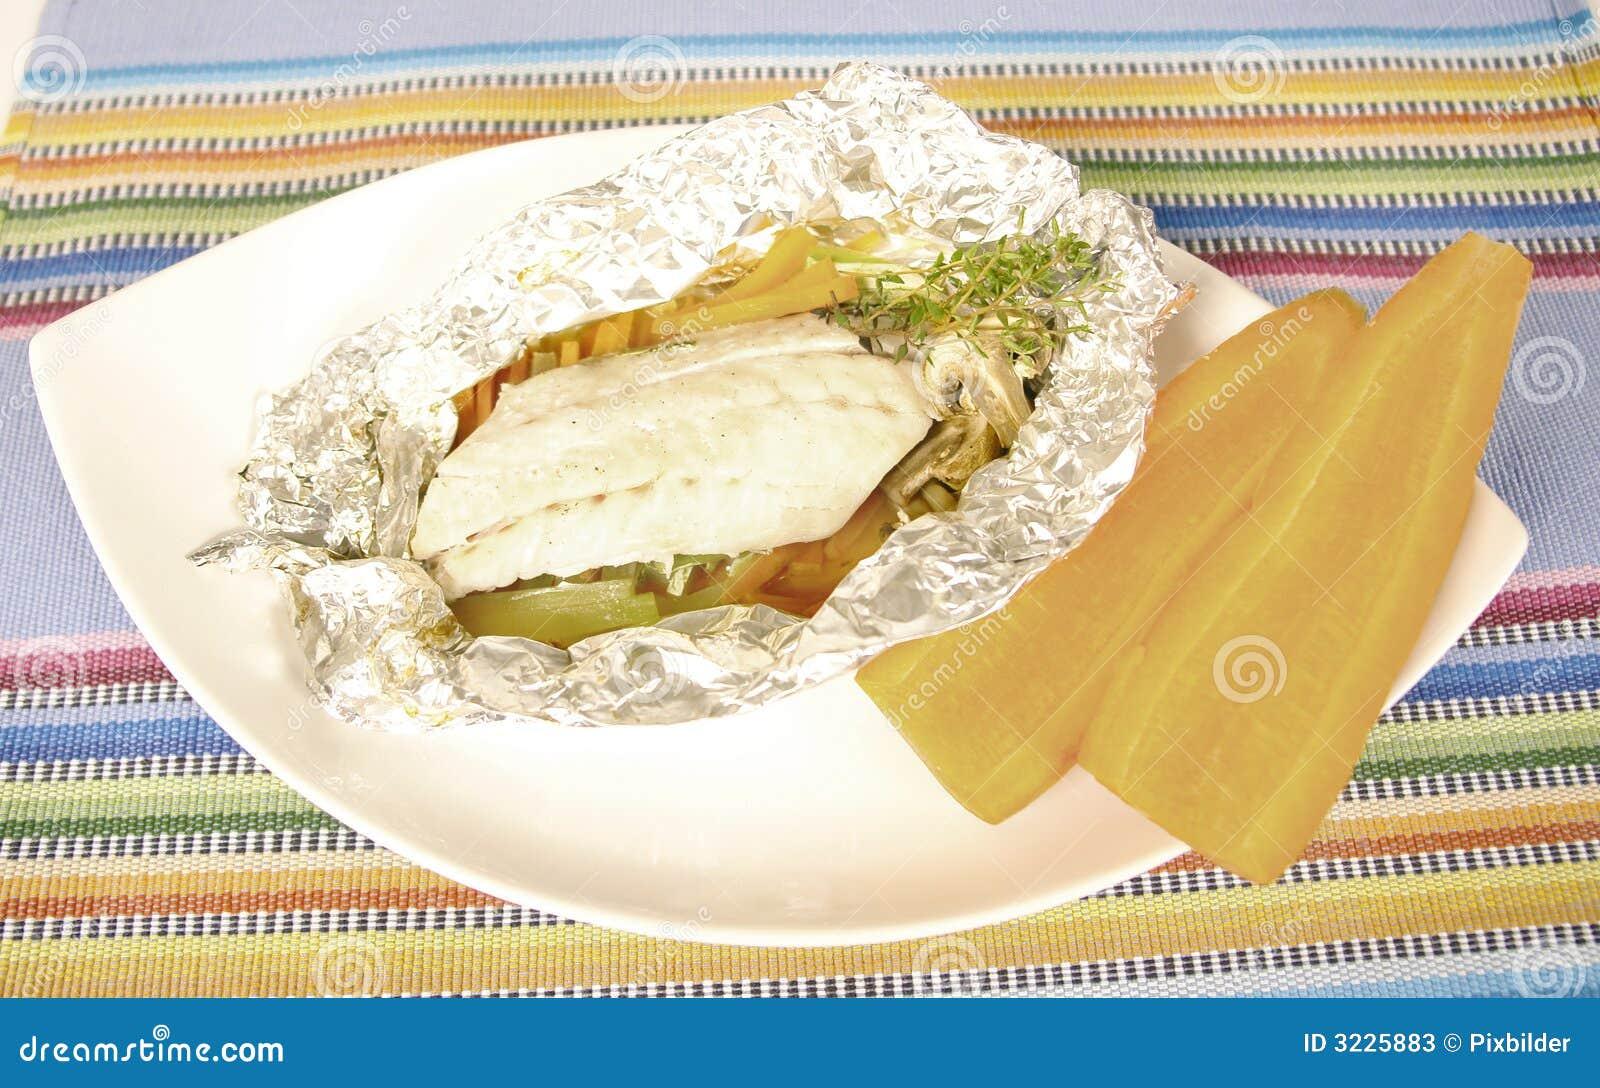 Aluminum foil fish in aluminum foil for Tin foil fish